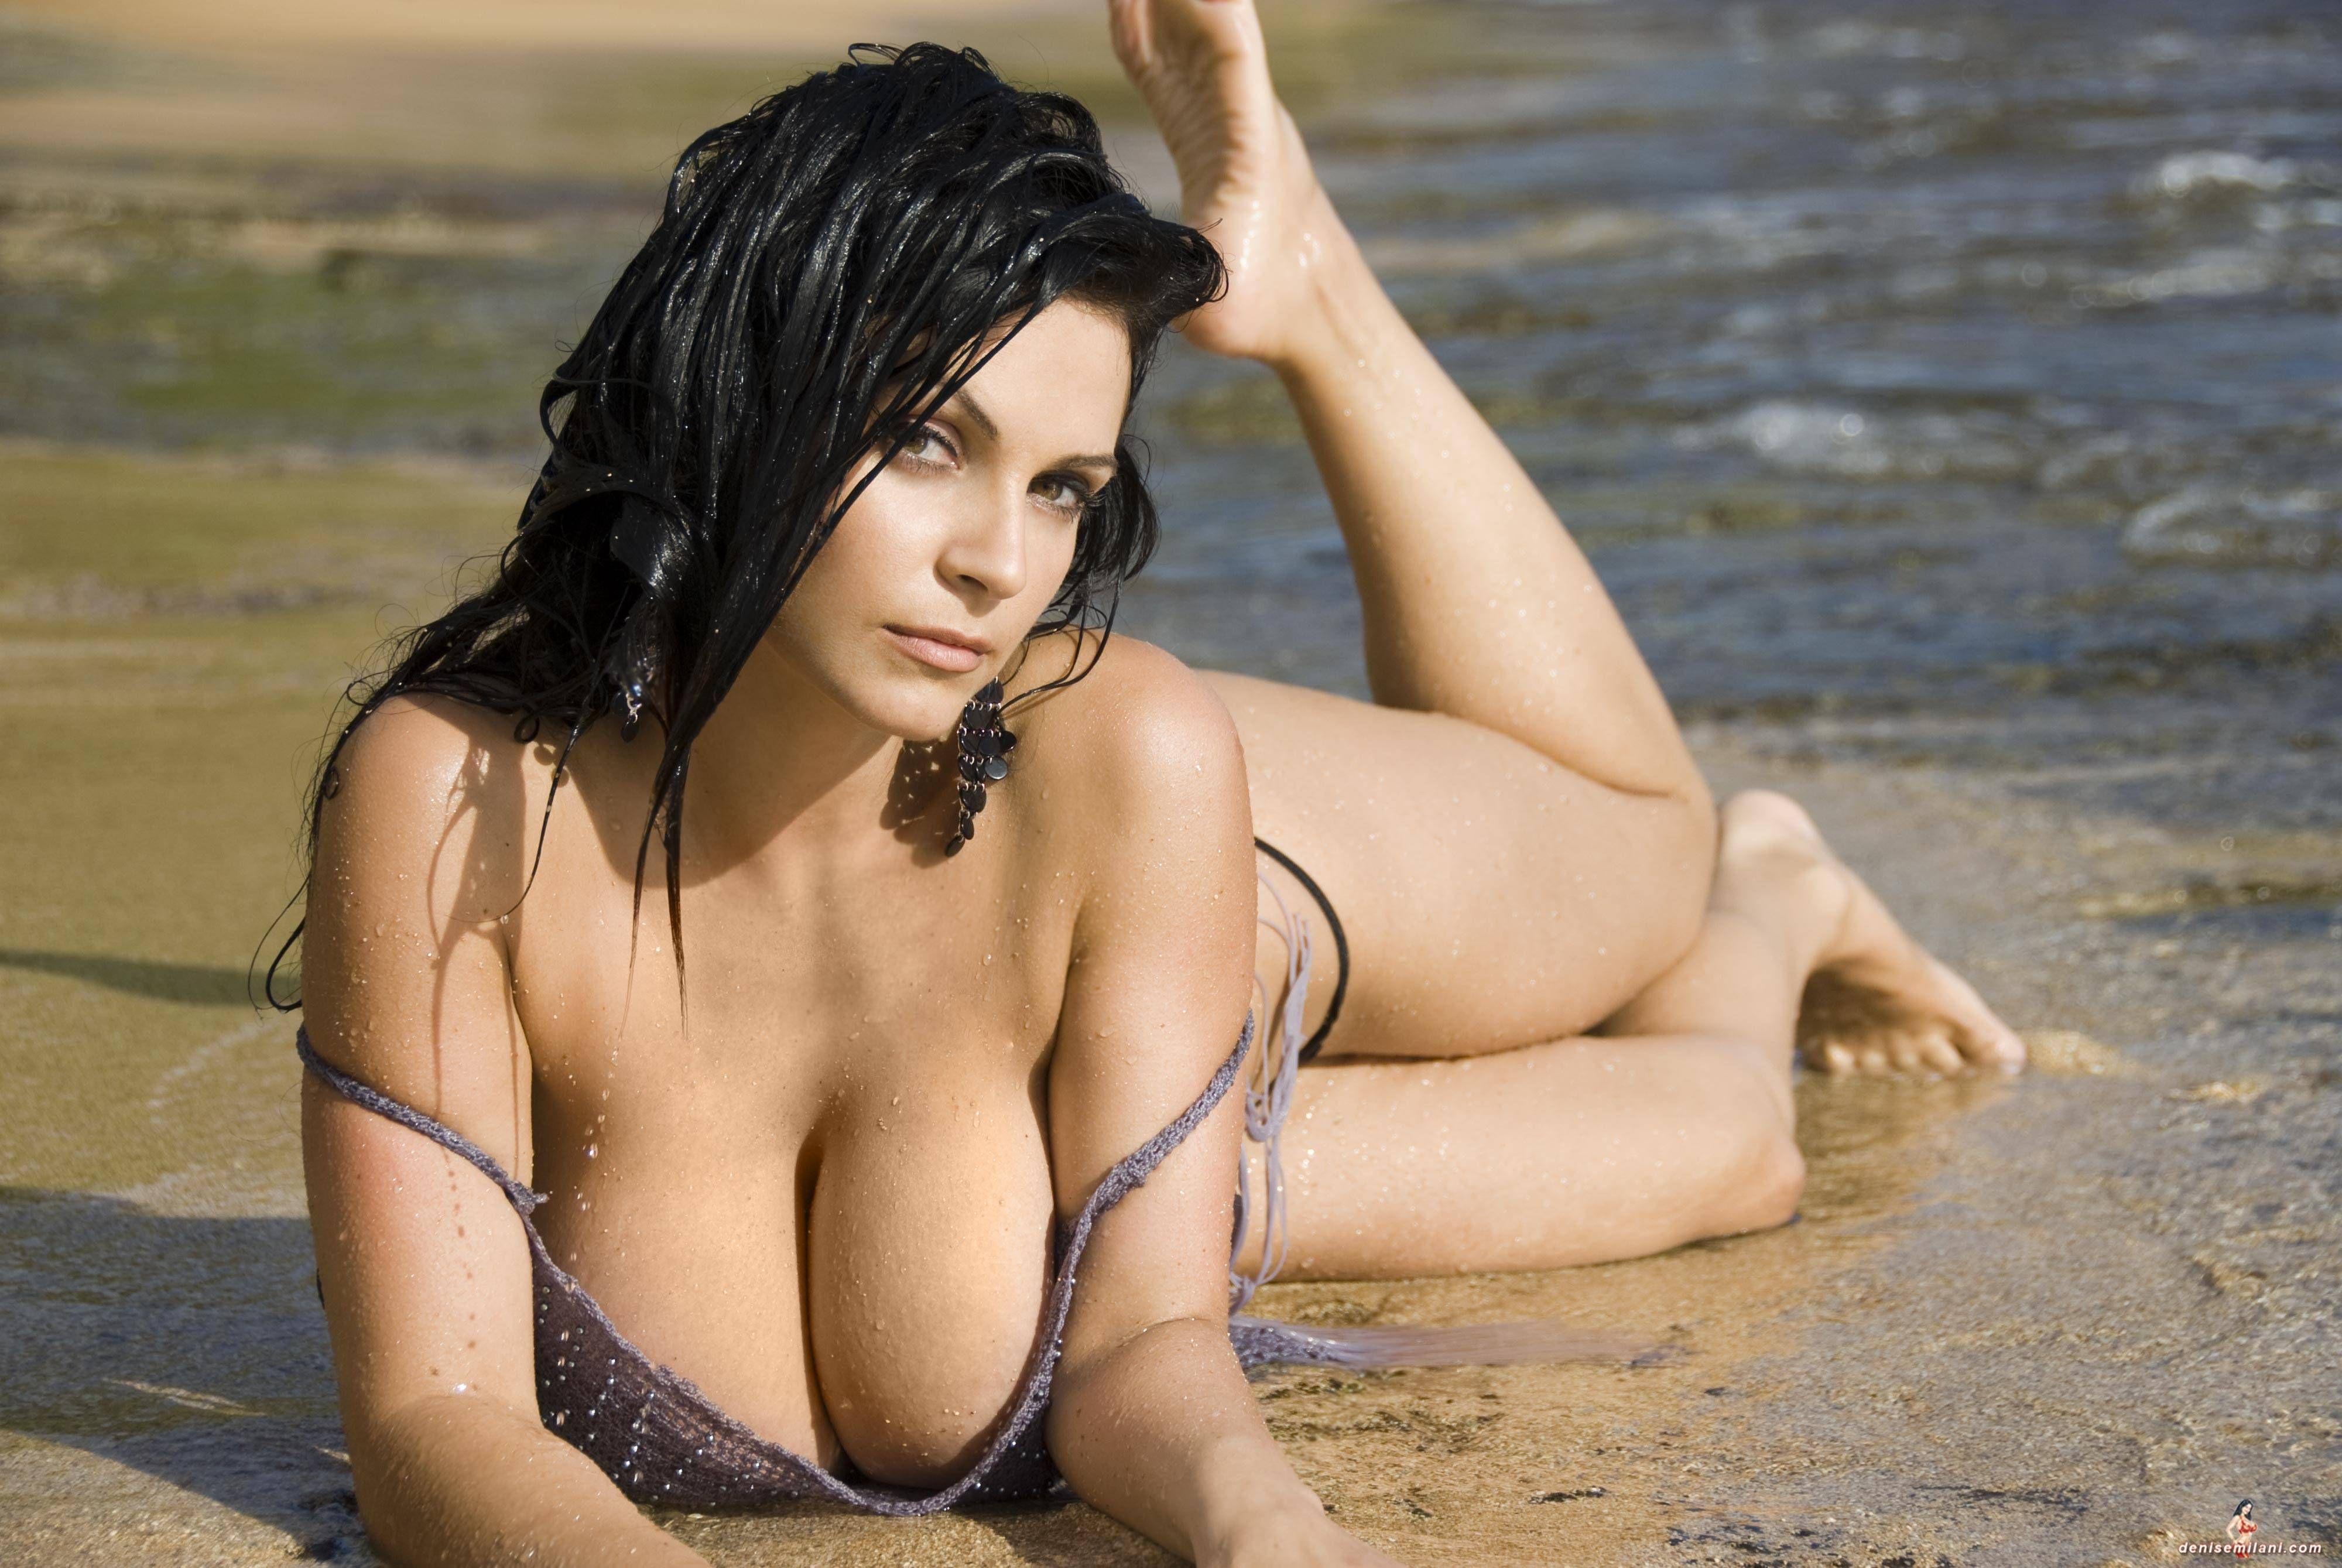 Nude female eye candy